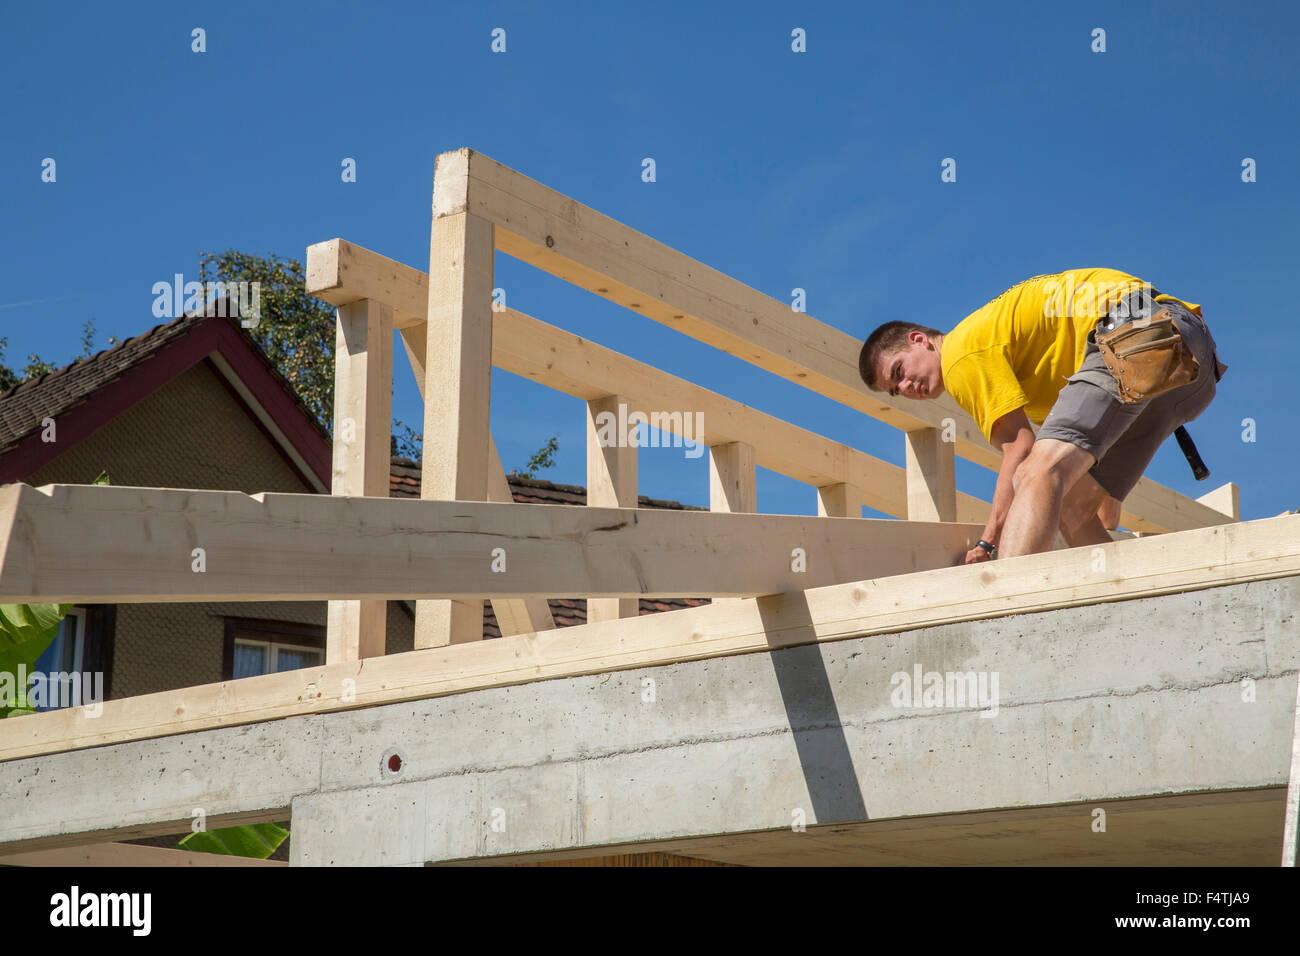 Holz-Rahmenkonstruktion, hölzerne Gebäude, Stockbild